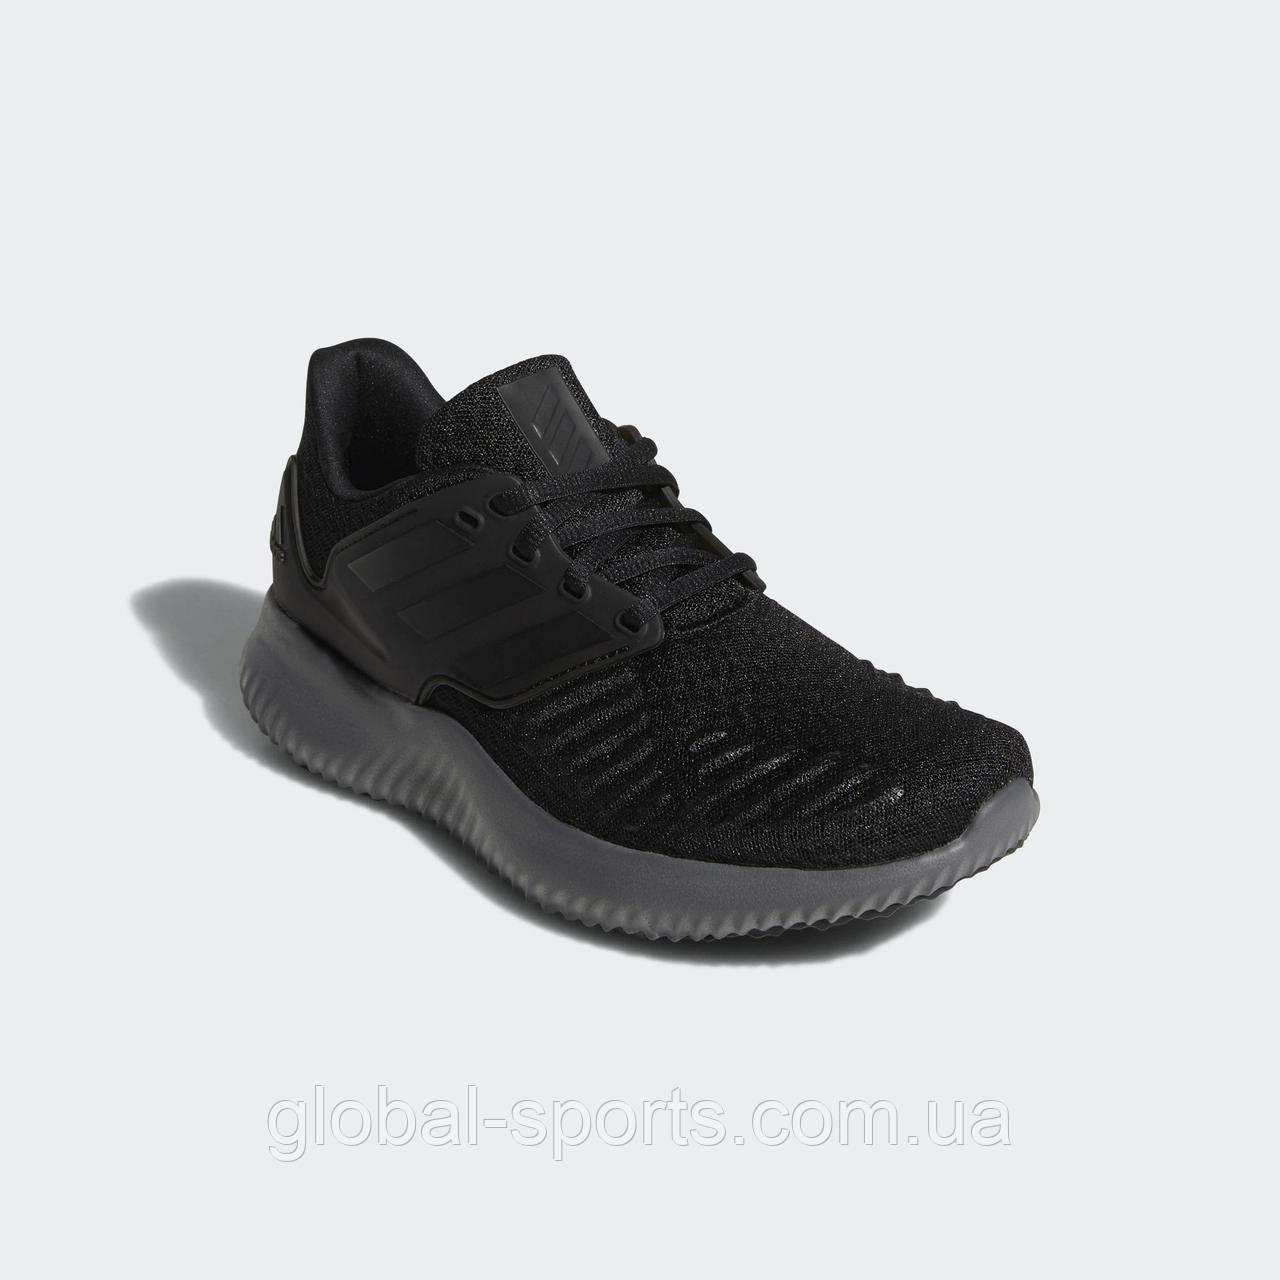 692ac758 ... Женские беговые кроссовки Adidas Alphabounce RC 2 W(Артикул:AQ0555), ...